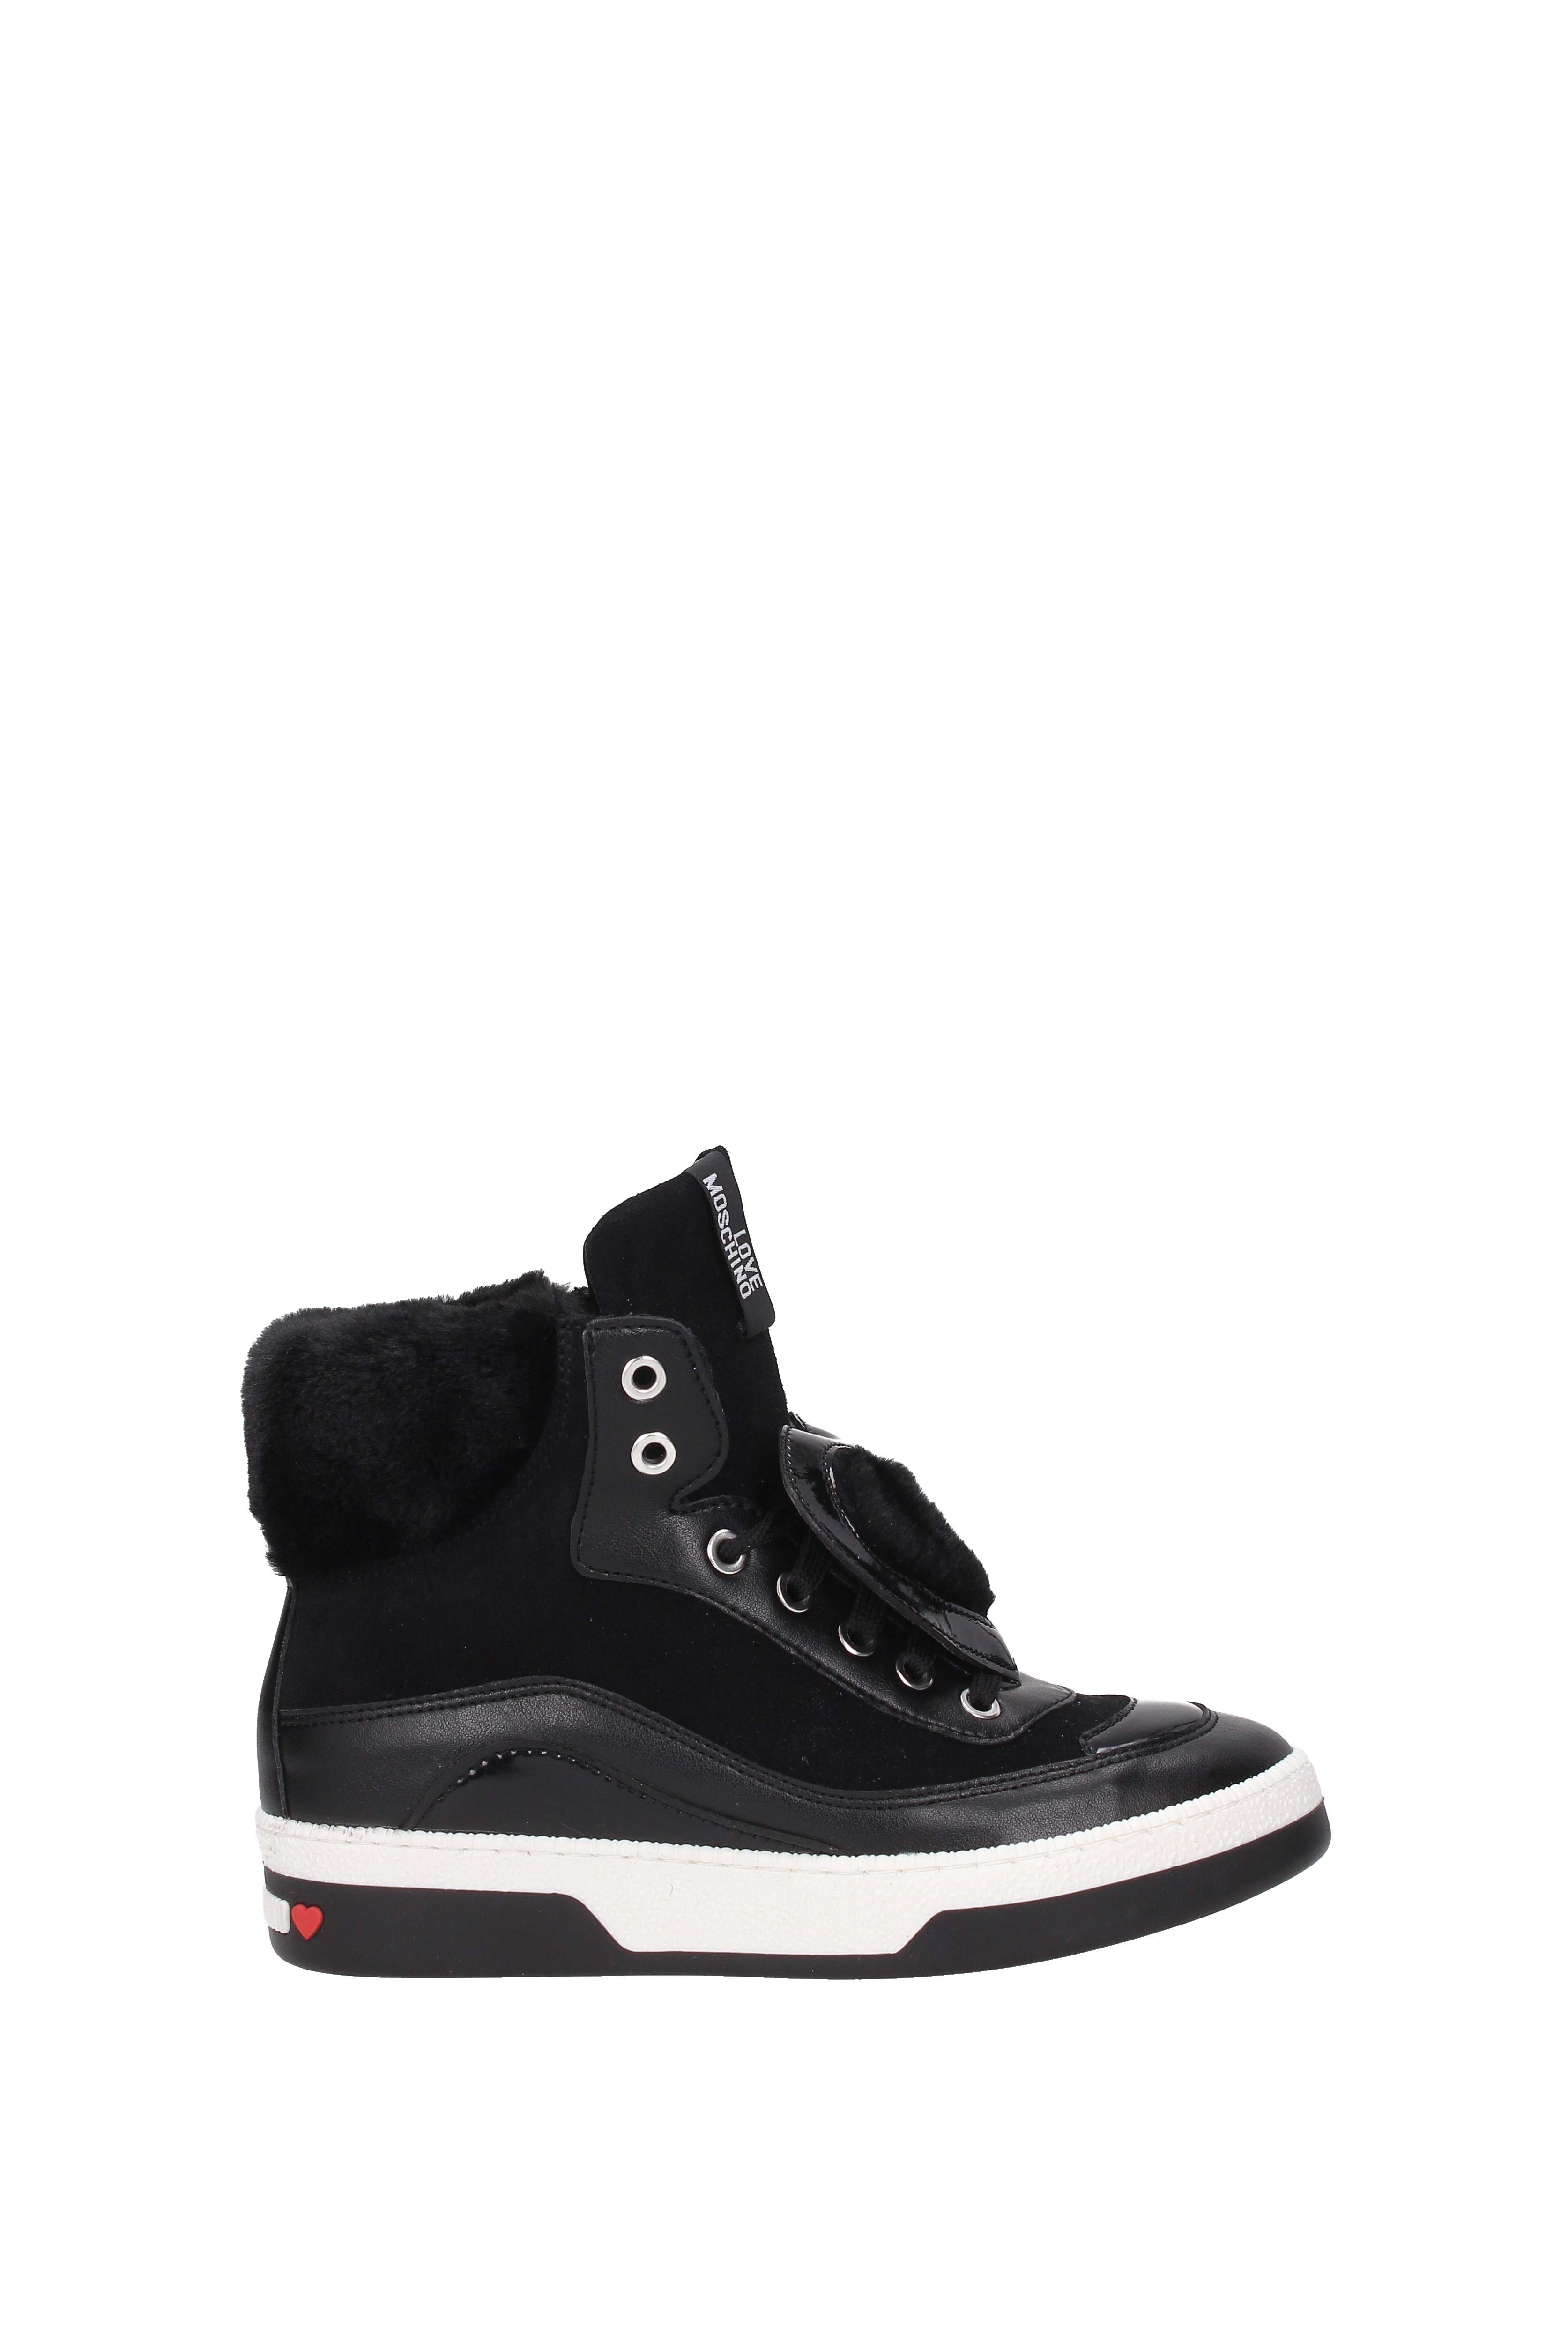 Sneakers-Love-Moschino-Women-Suede-JA15343G04JJ1